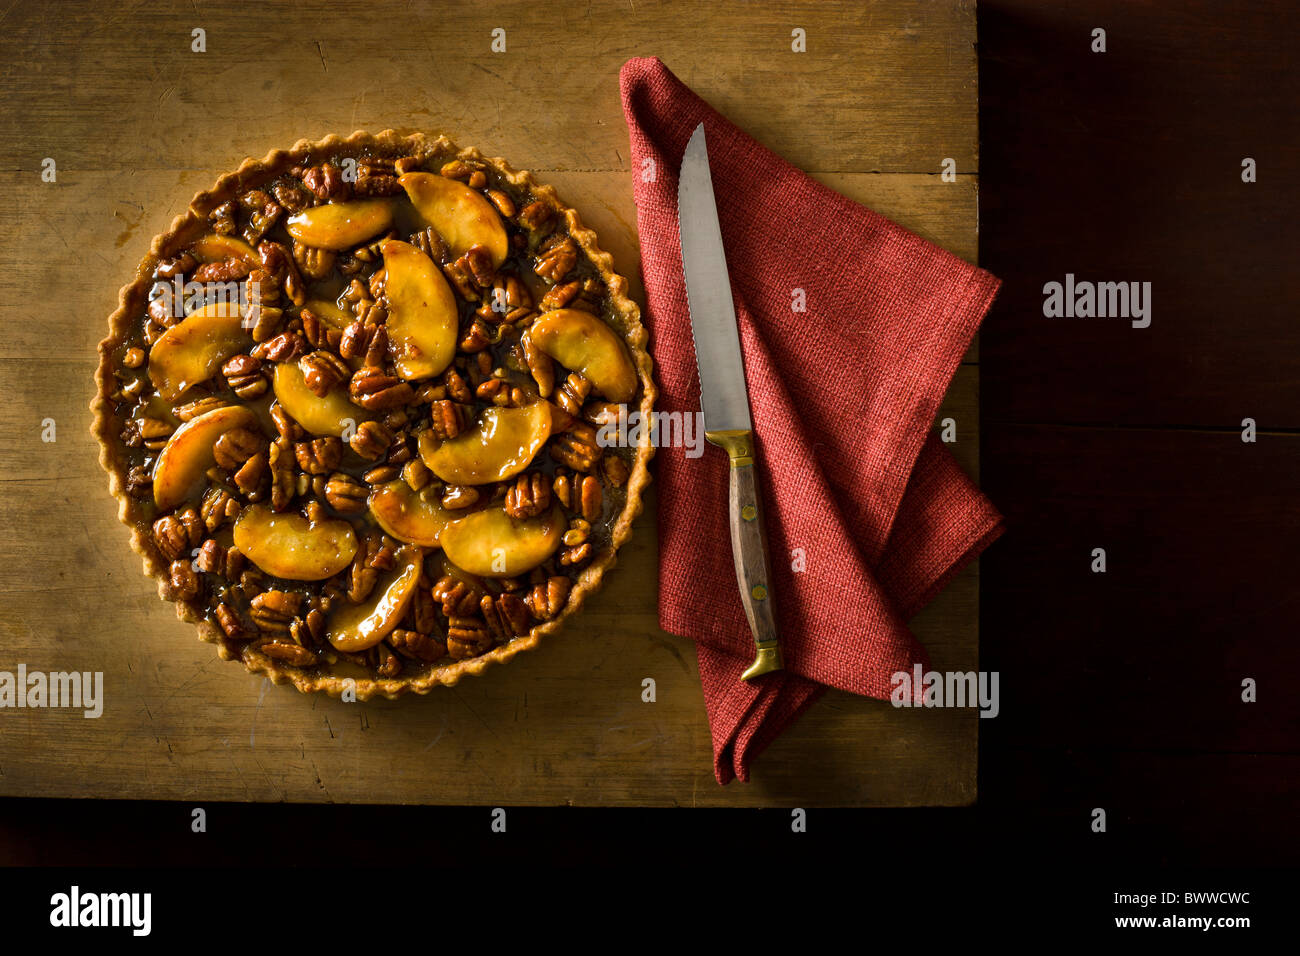 Apple Torta alle noci pecan Immagini Stock